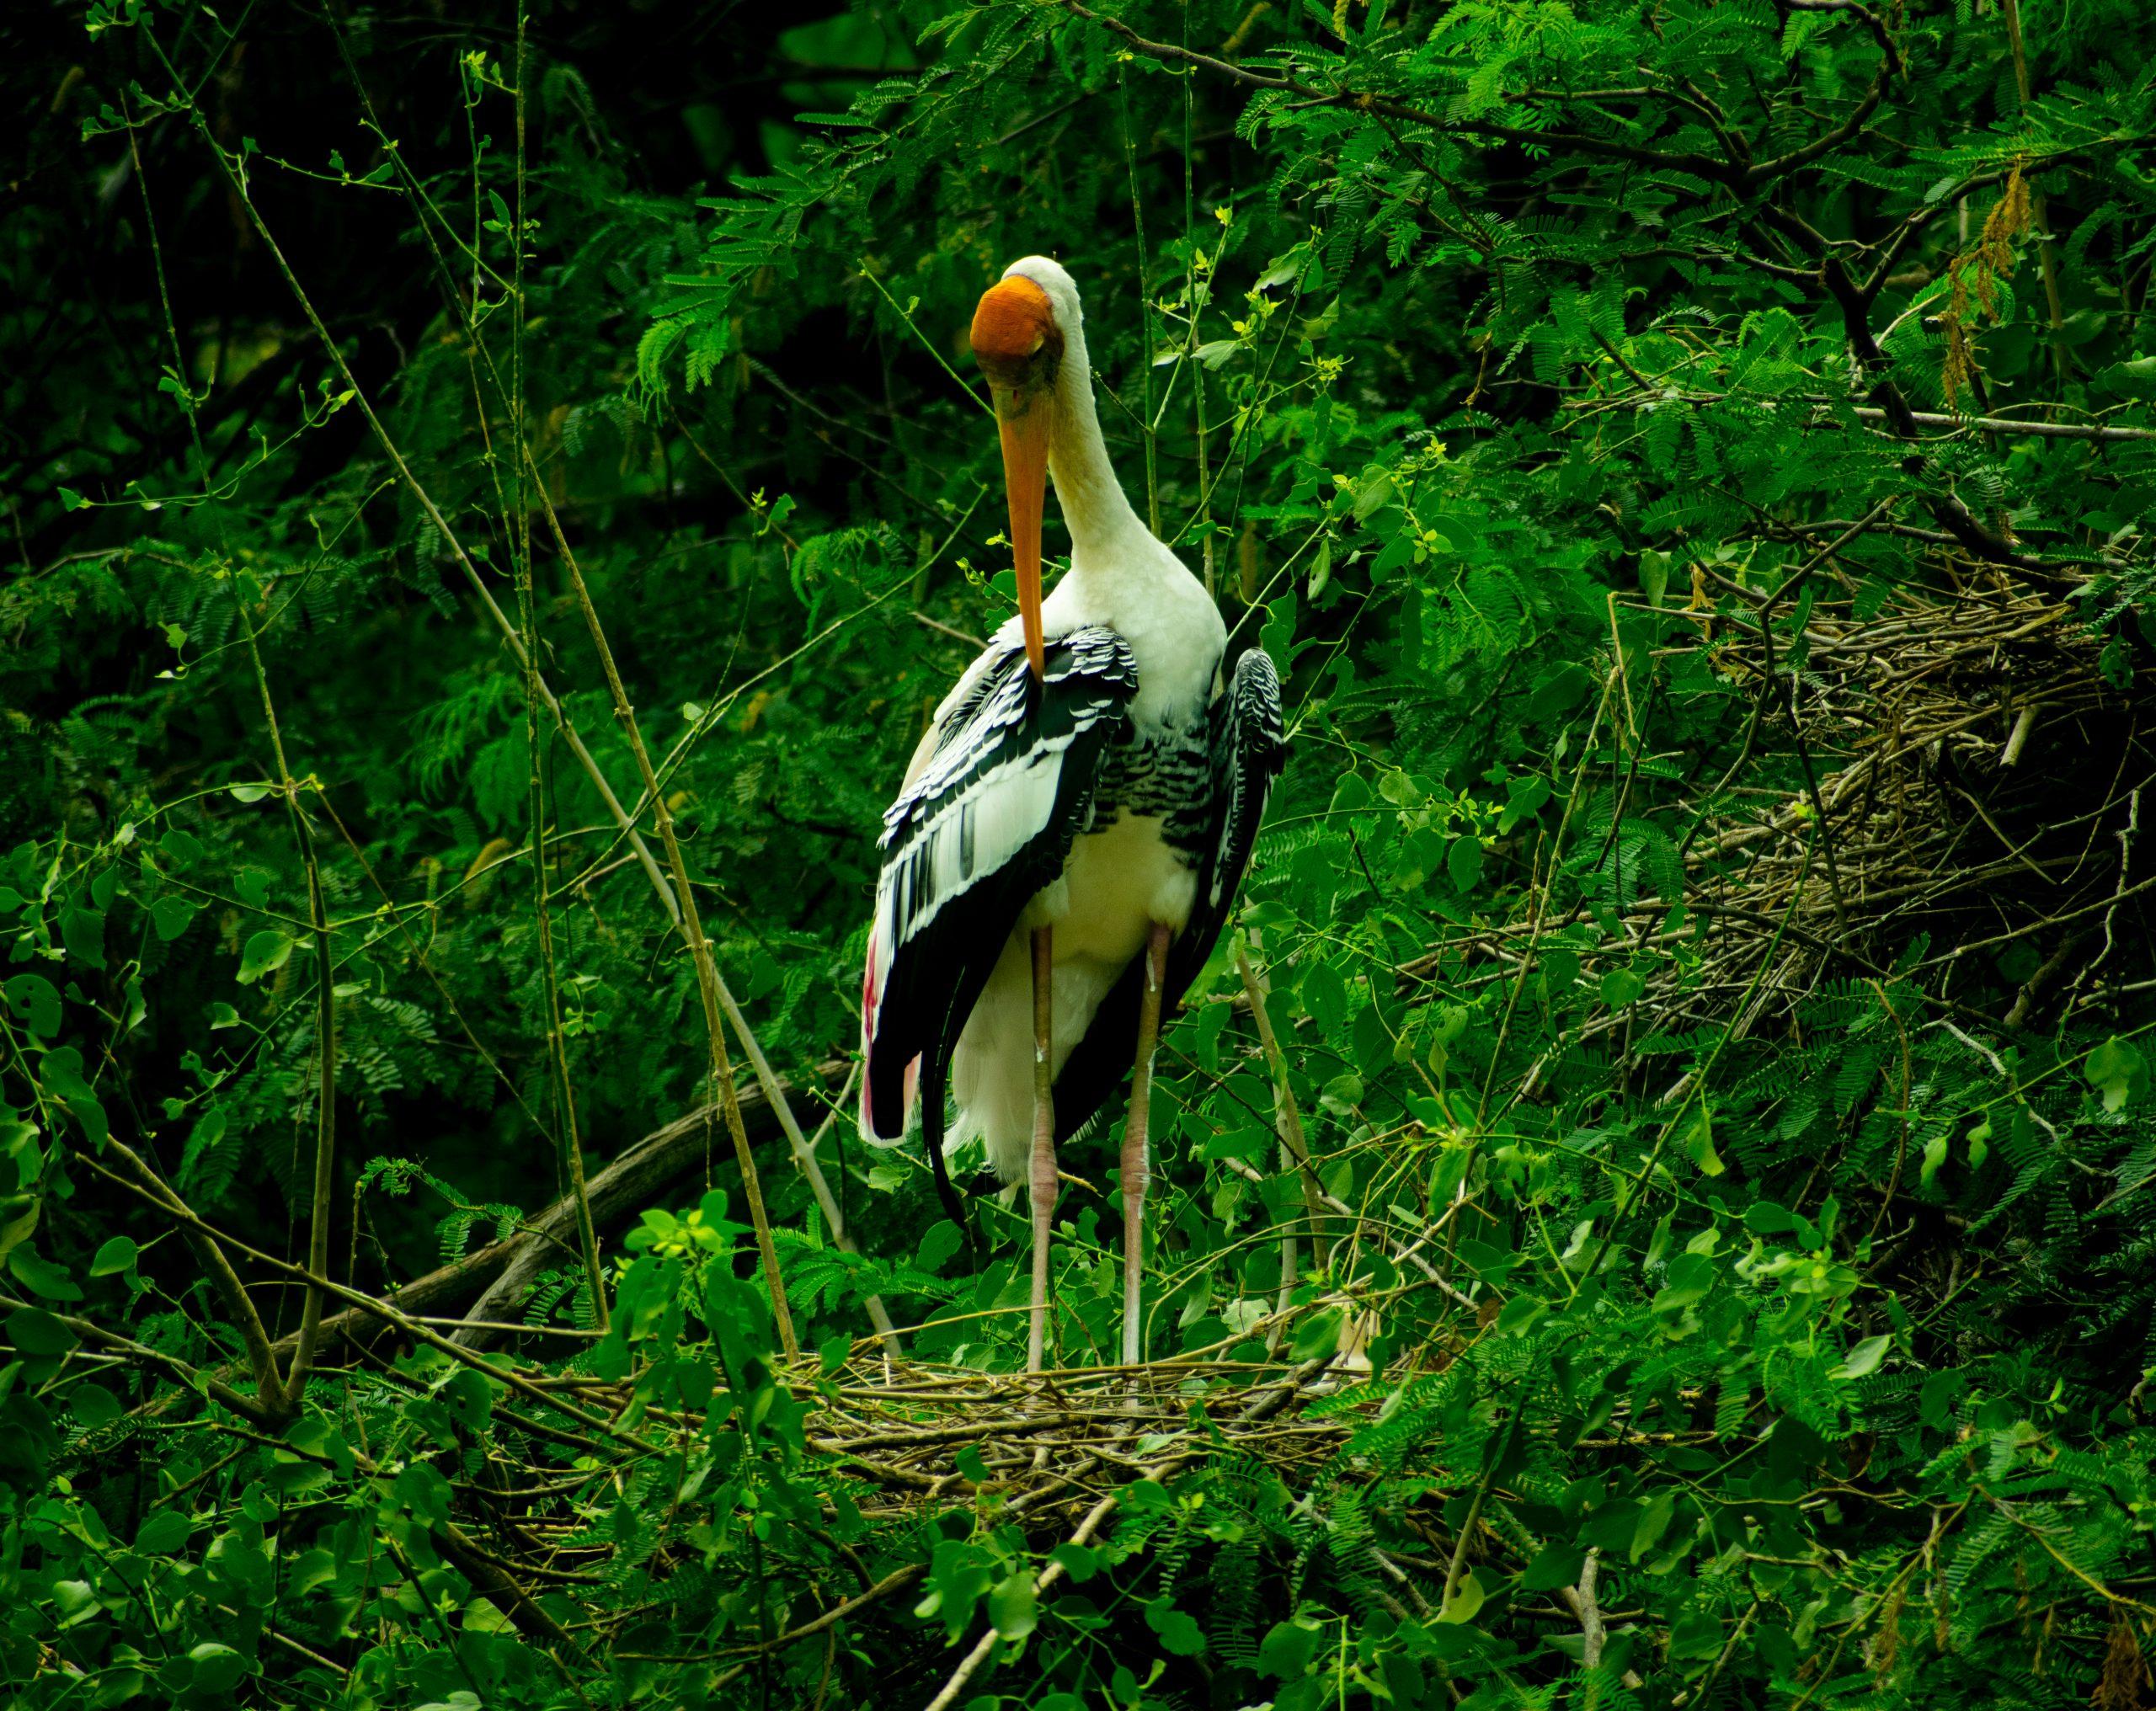 Stork on a tree